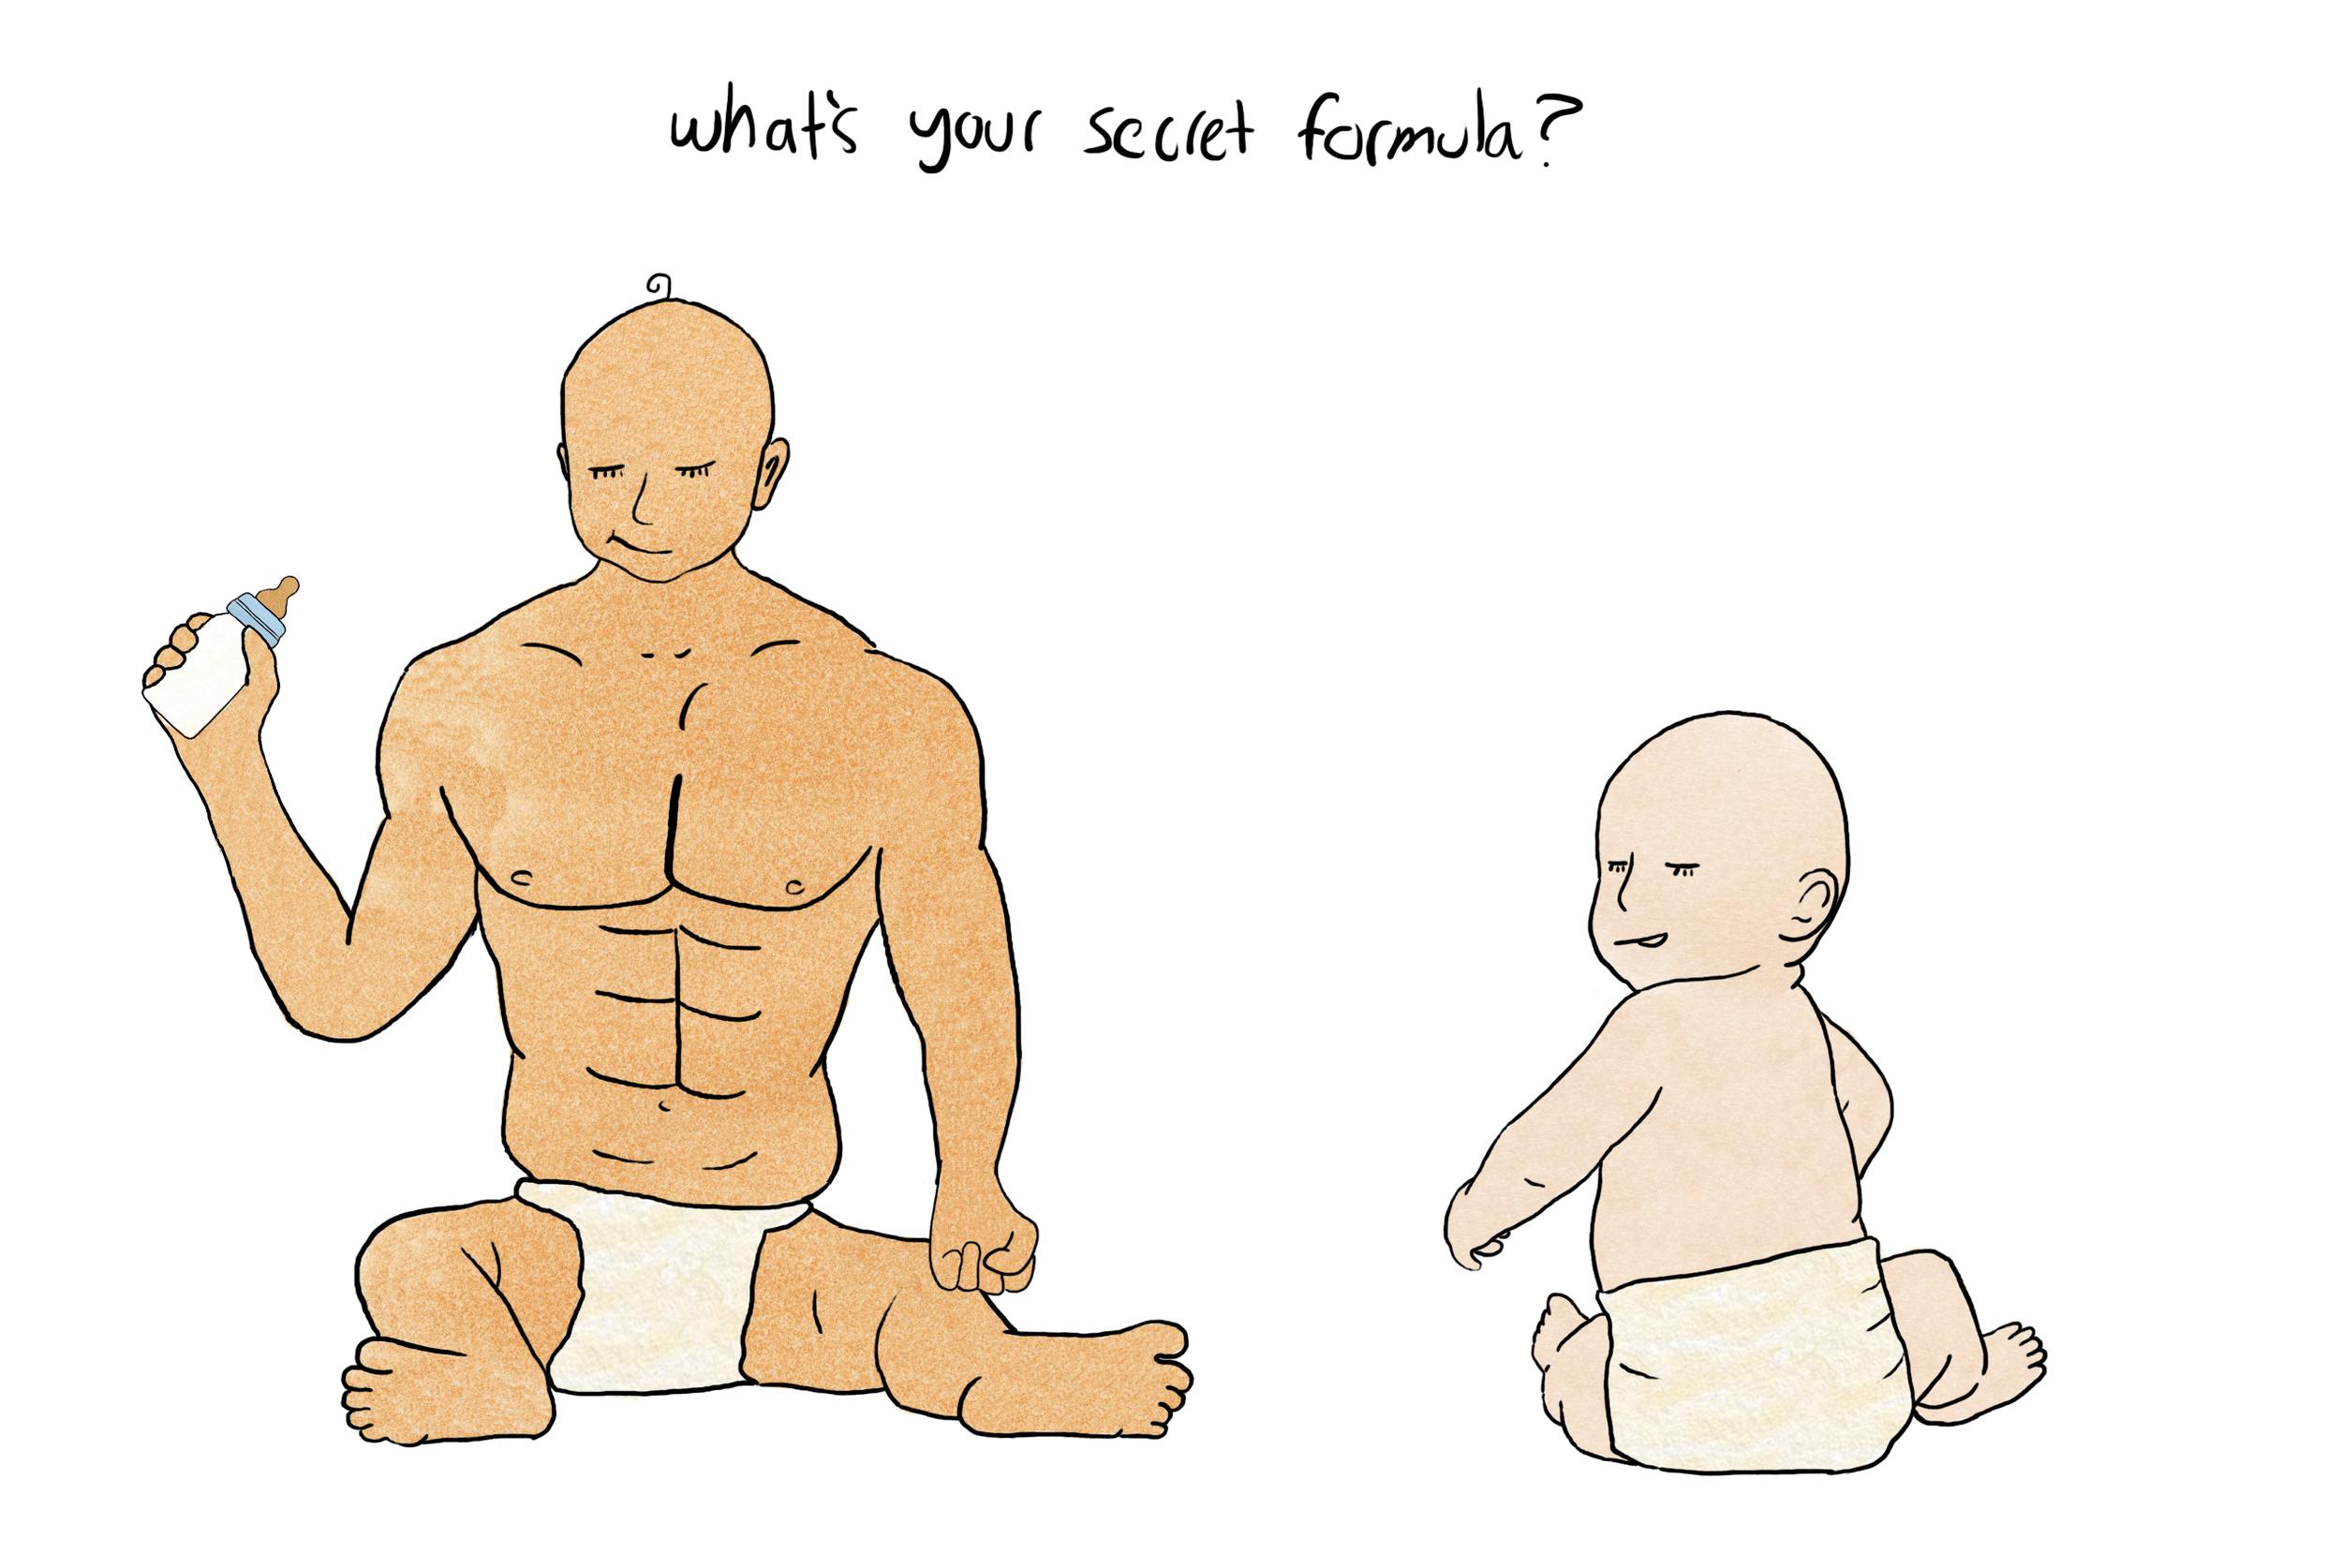 secret formula.png